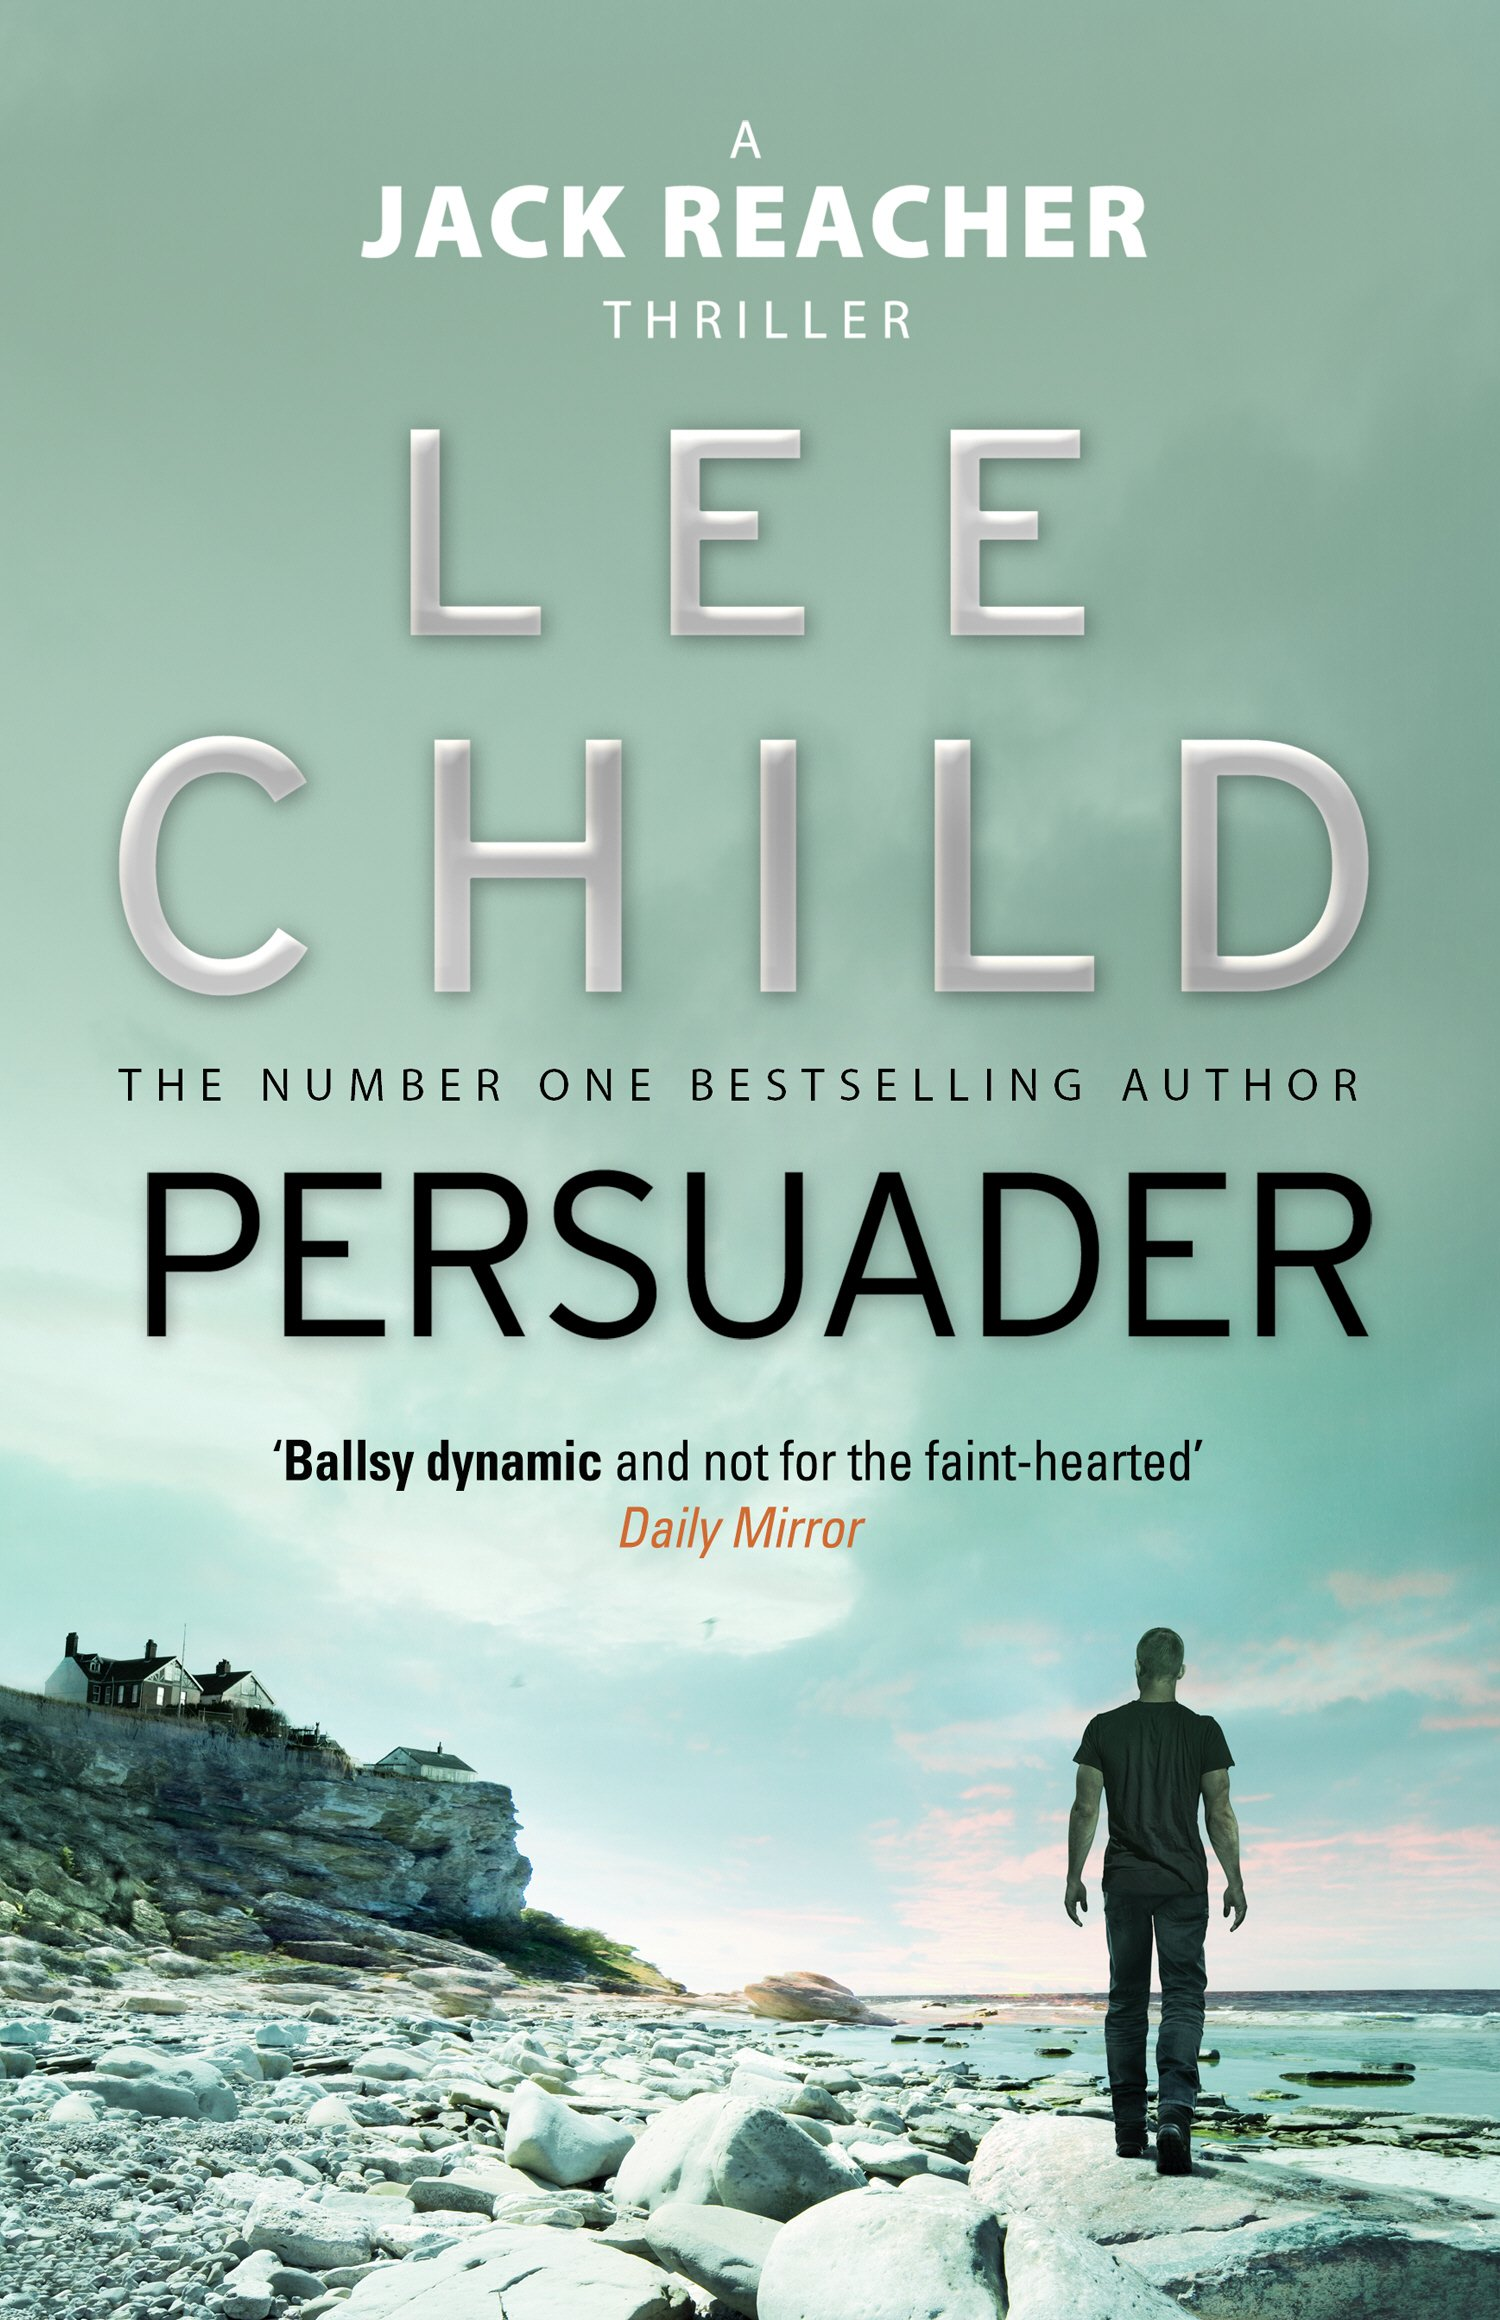 Jack Reacher Vol. 7: Persuader